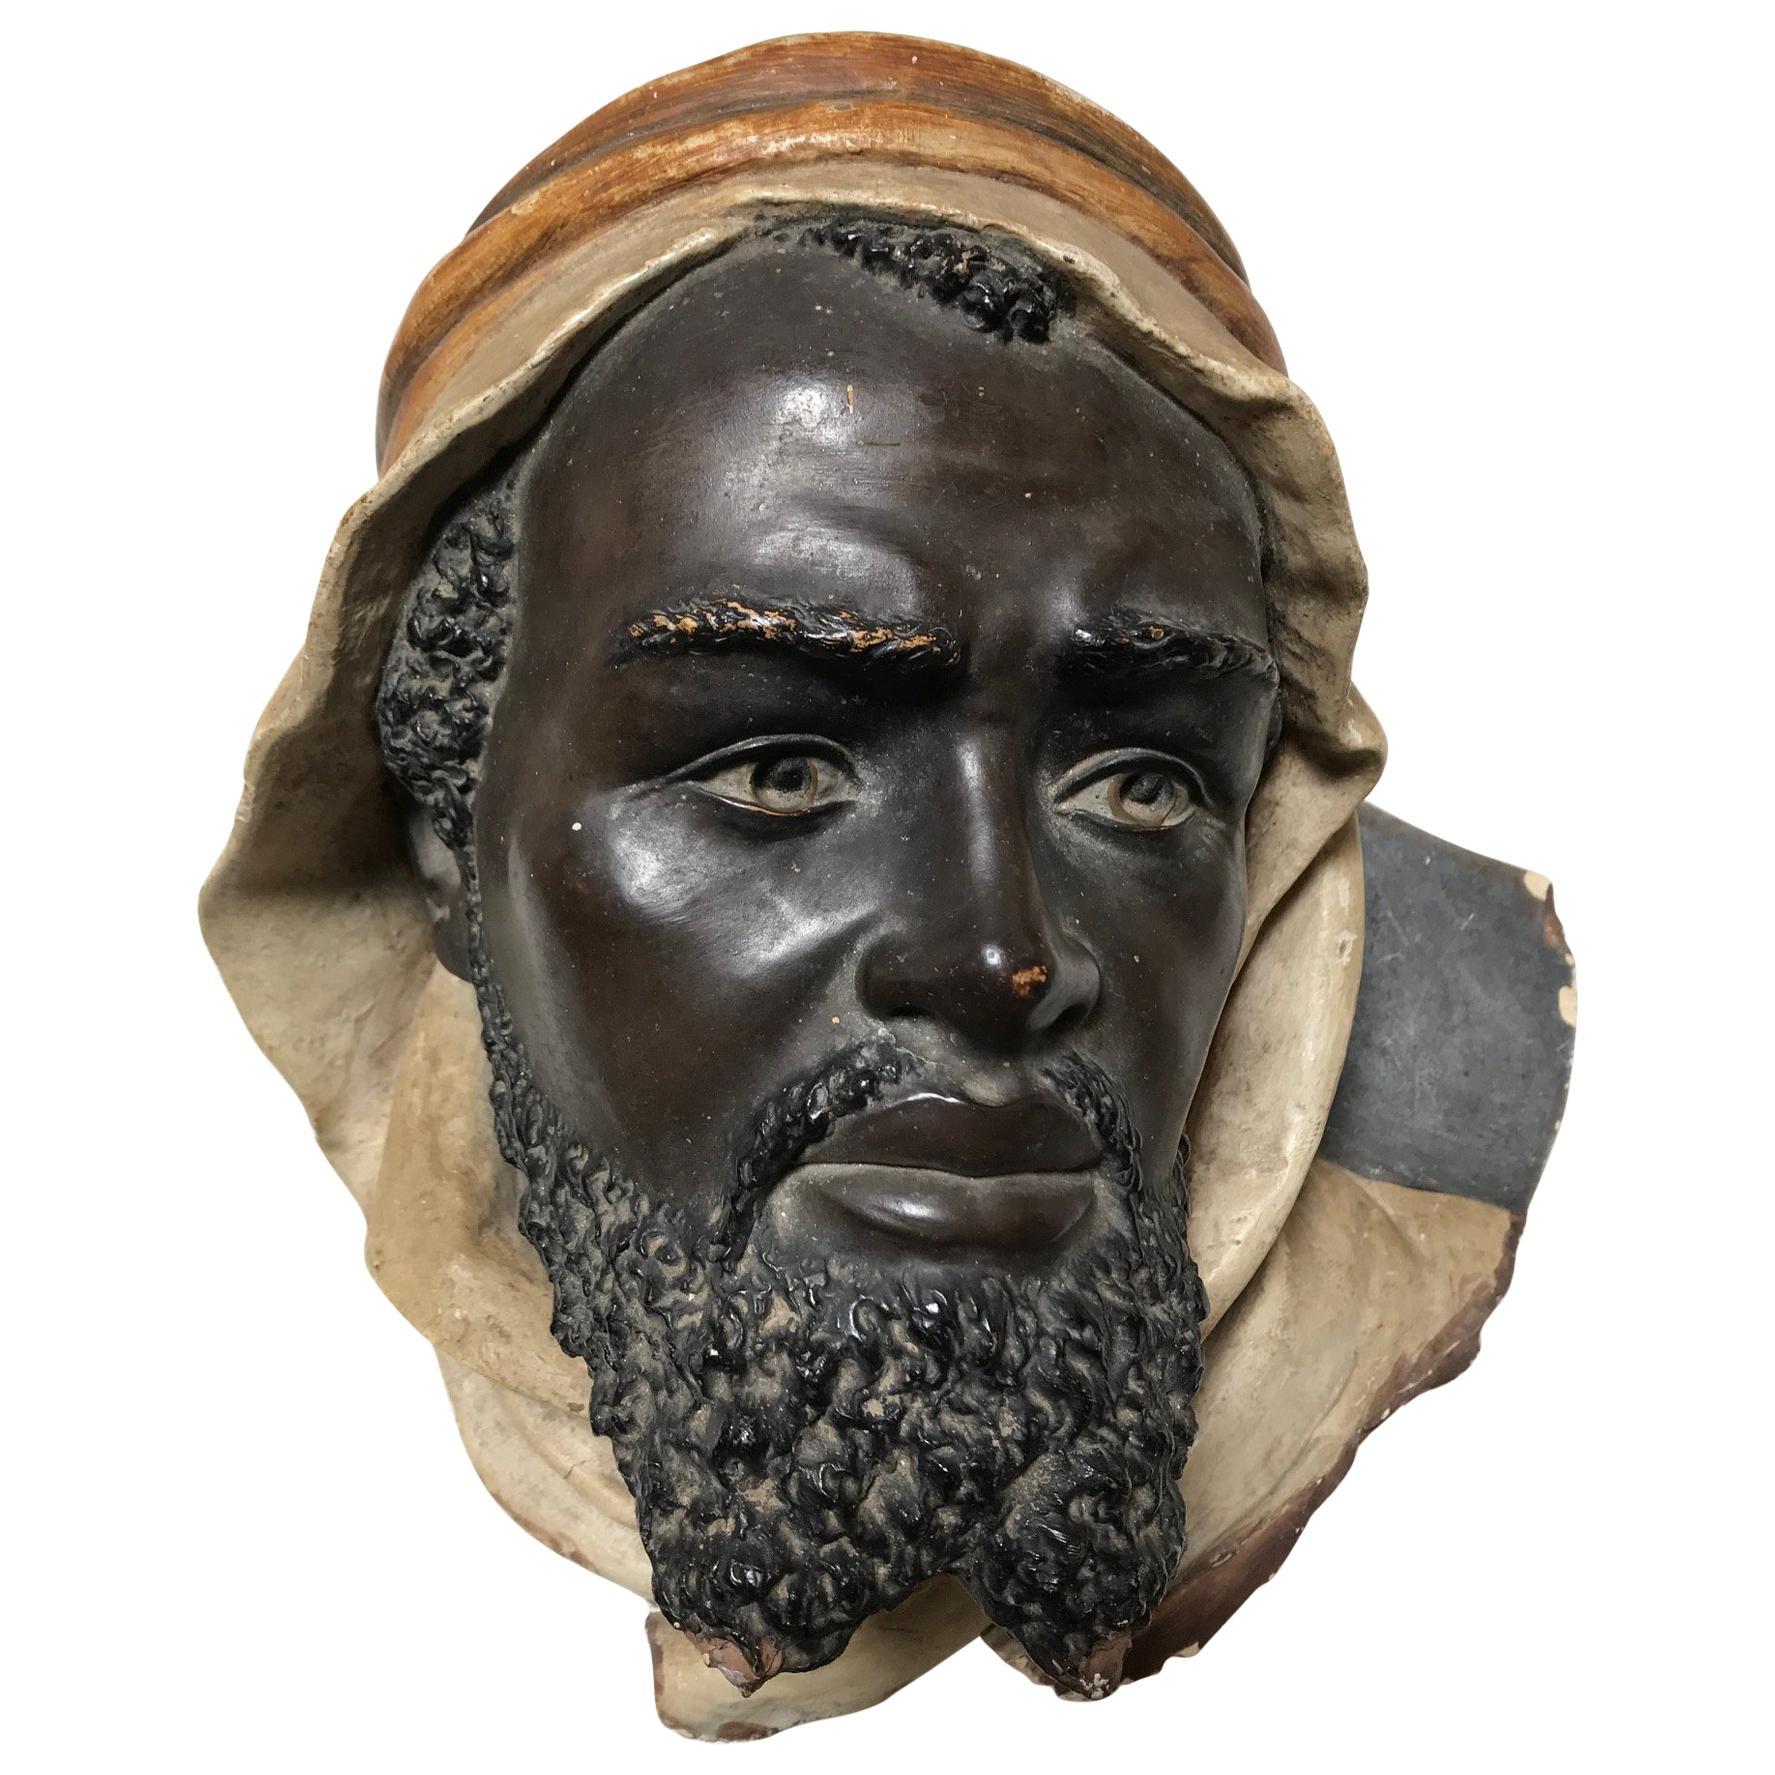 19th Century Terracotta Bust of an Arab Man